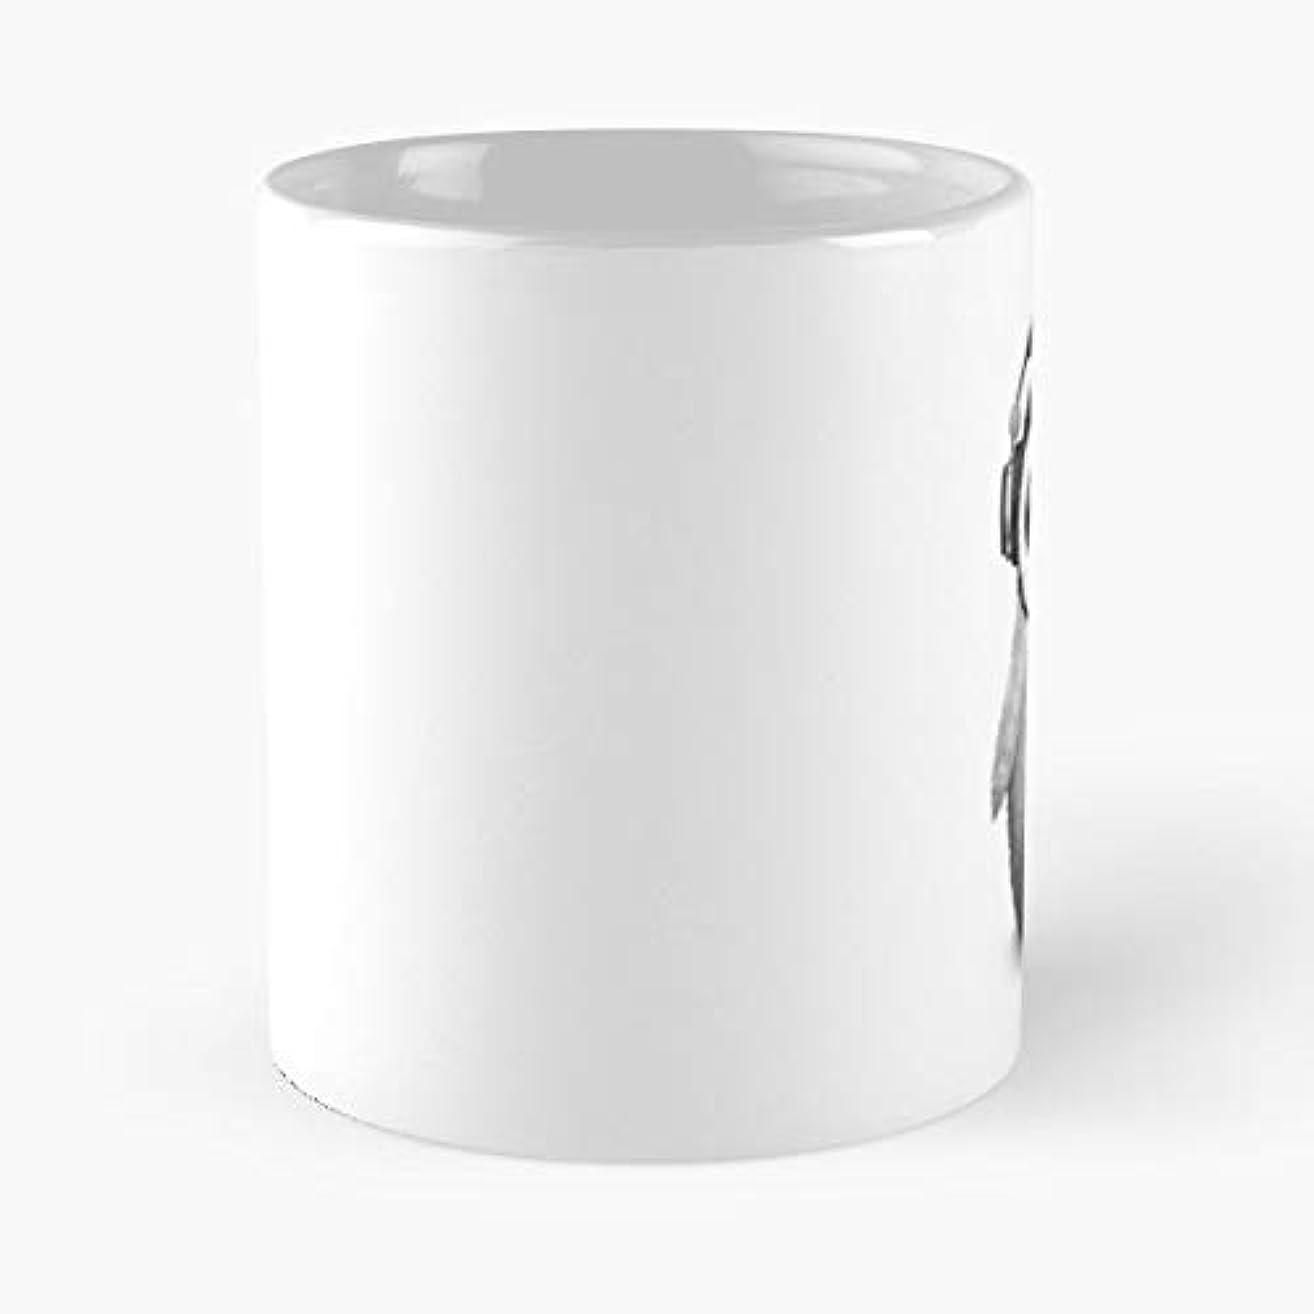 Penguin Baby Dj - Funny Coffee Mug, Gag Gift Poop Fun Mugs